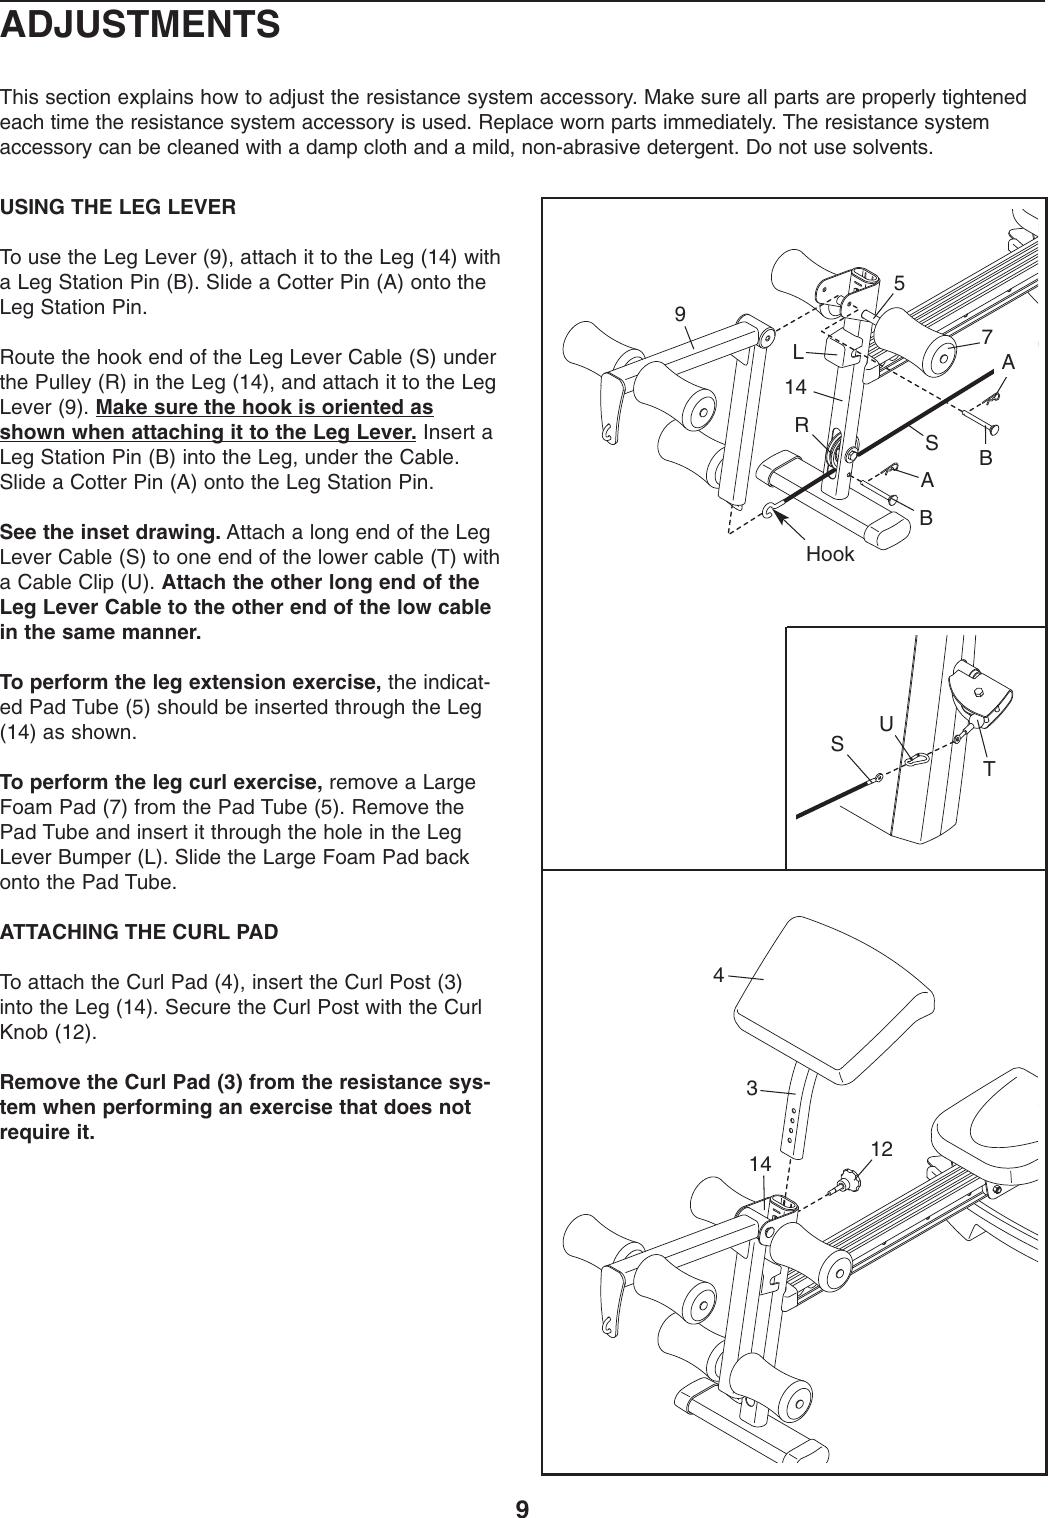 Weider Crossbar Platinum Accessory Wemc0773 Users Manual WEMC07730 ...